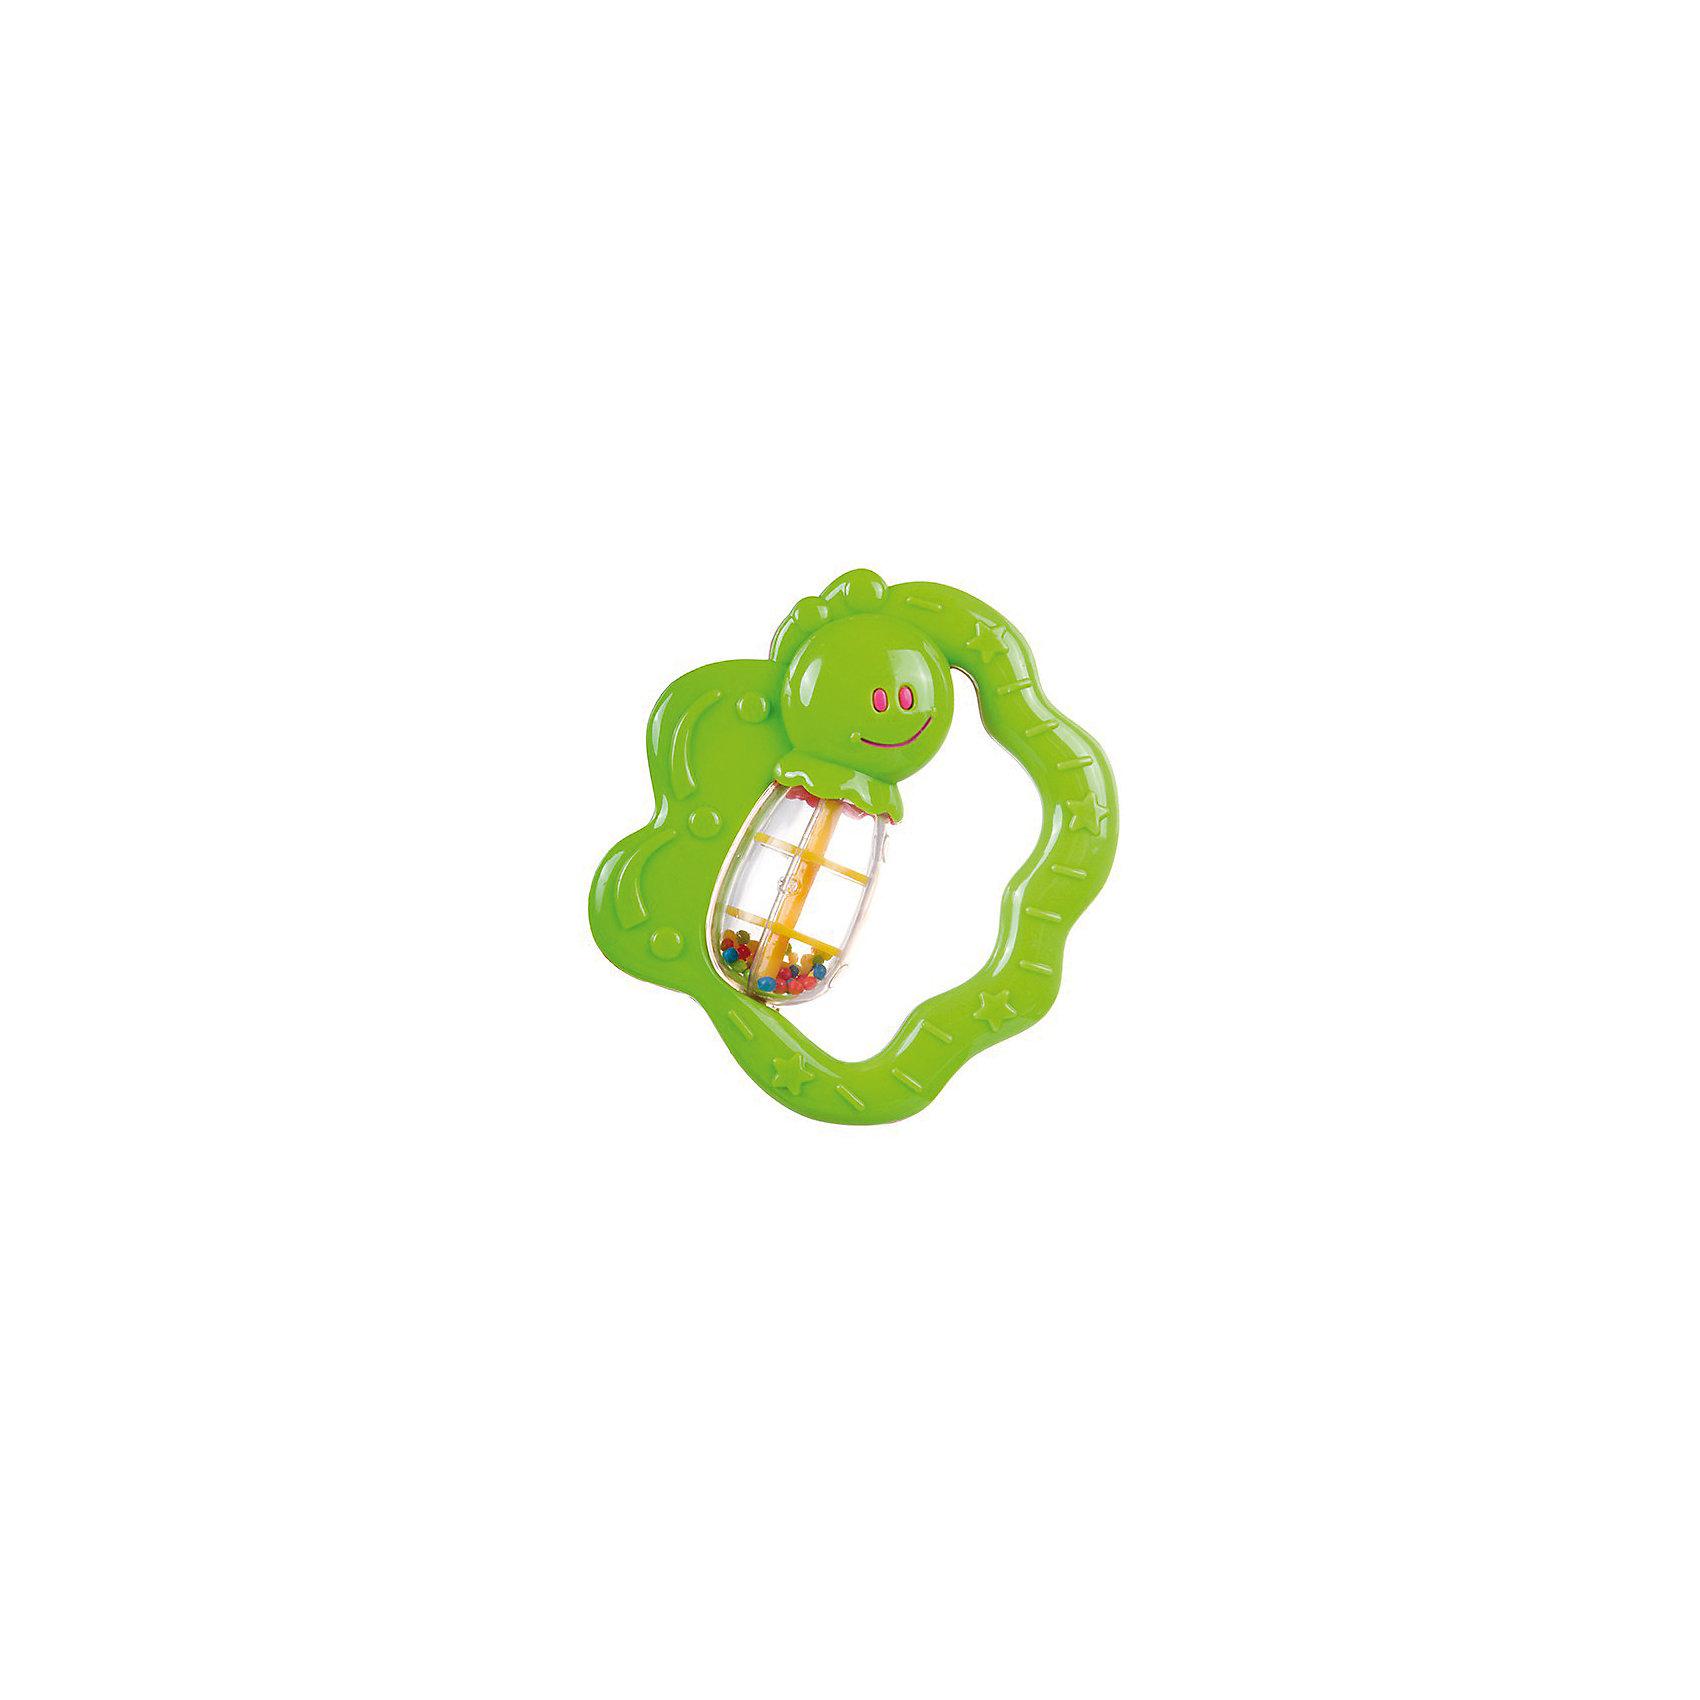 Canpol Babies Погремушка Бабочка, 0+, Canpol Babies, зеленый canpol babies погремушка бабочка 0 canpol babies зеленый